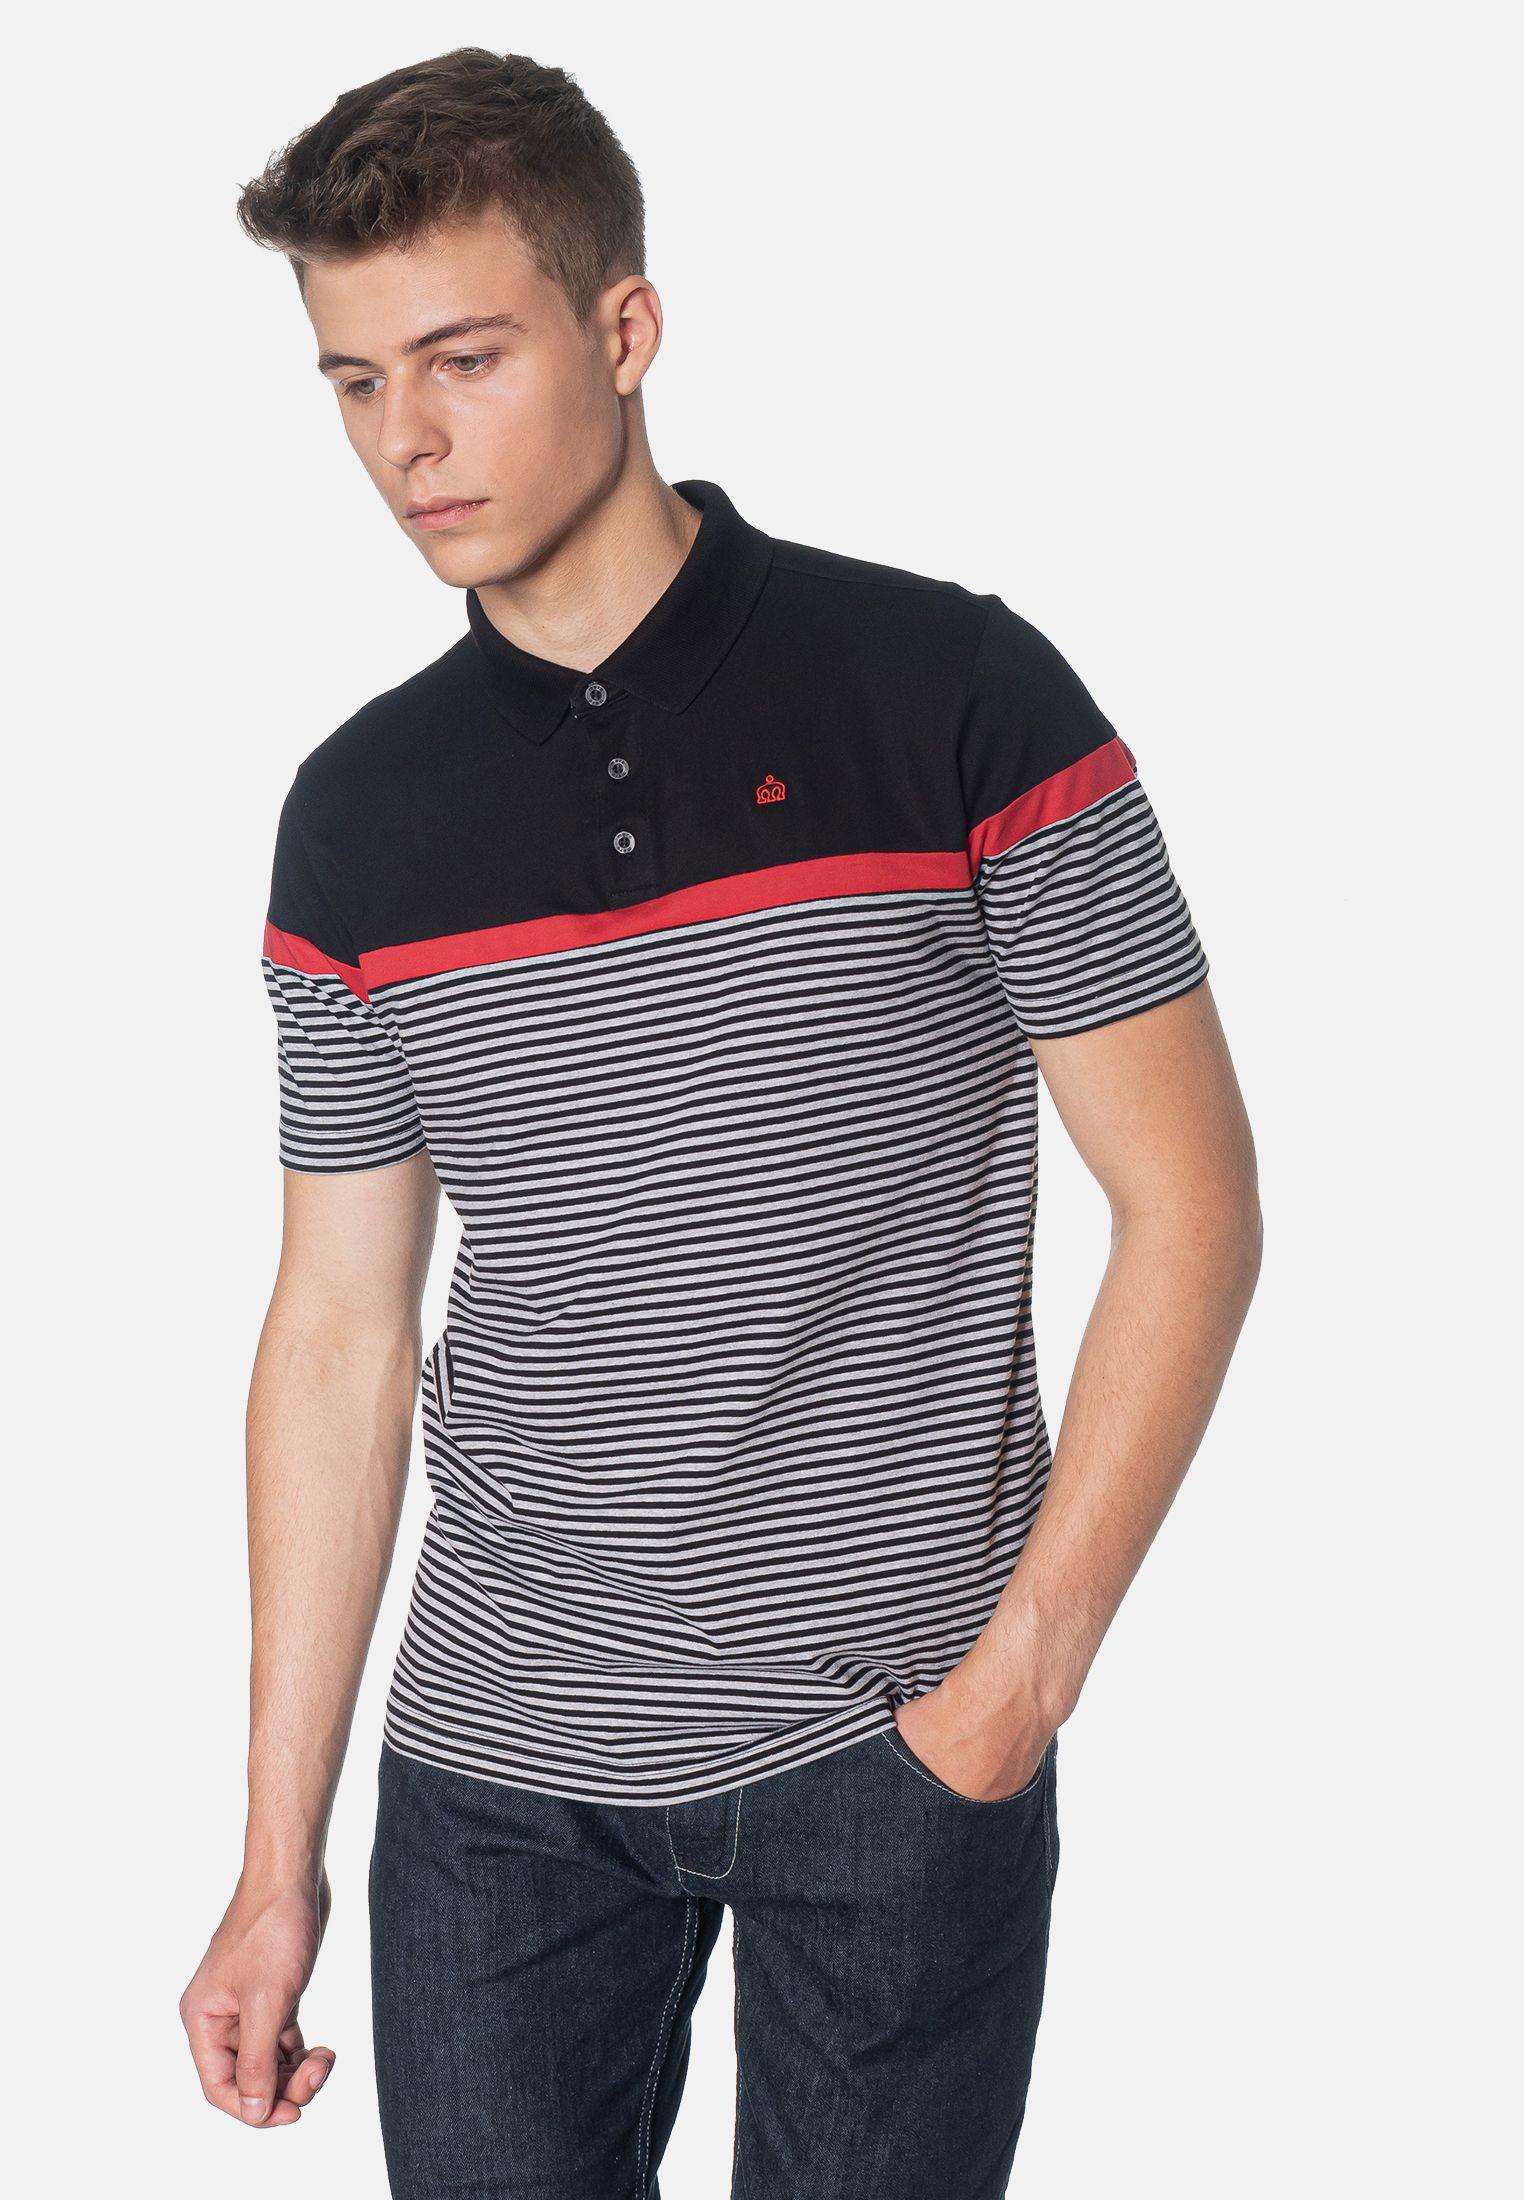 Clarence Colour Block Stripes Men's Polo Shirt in Black